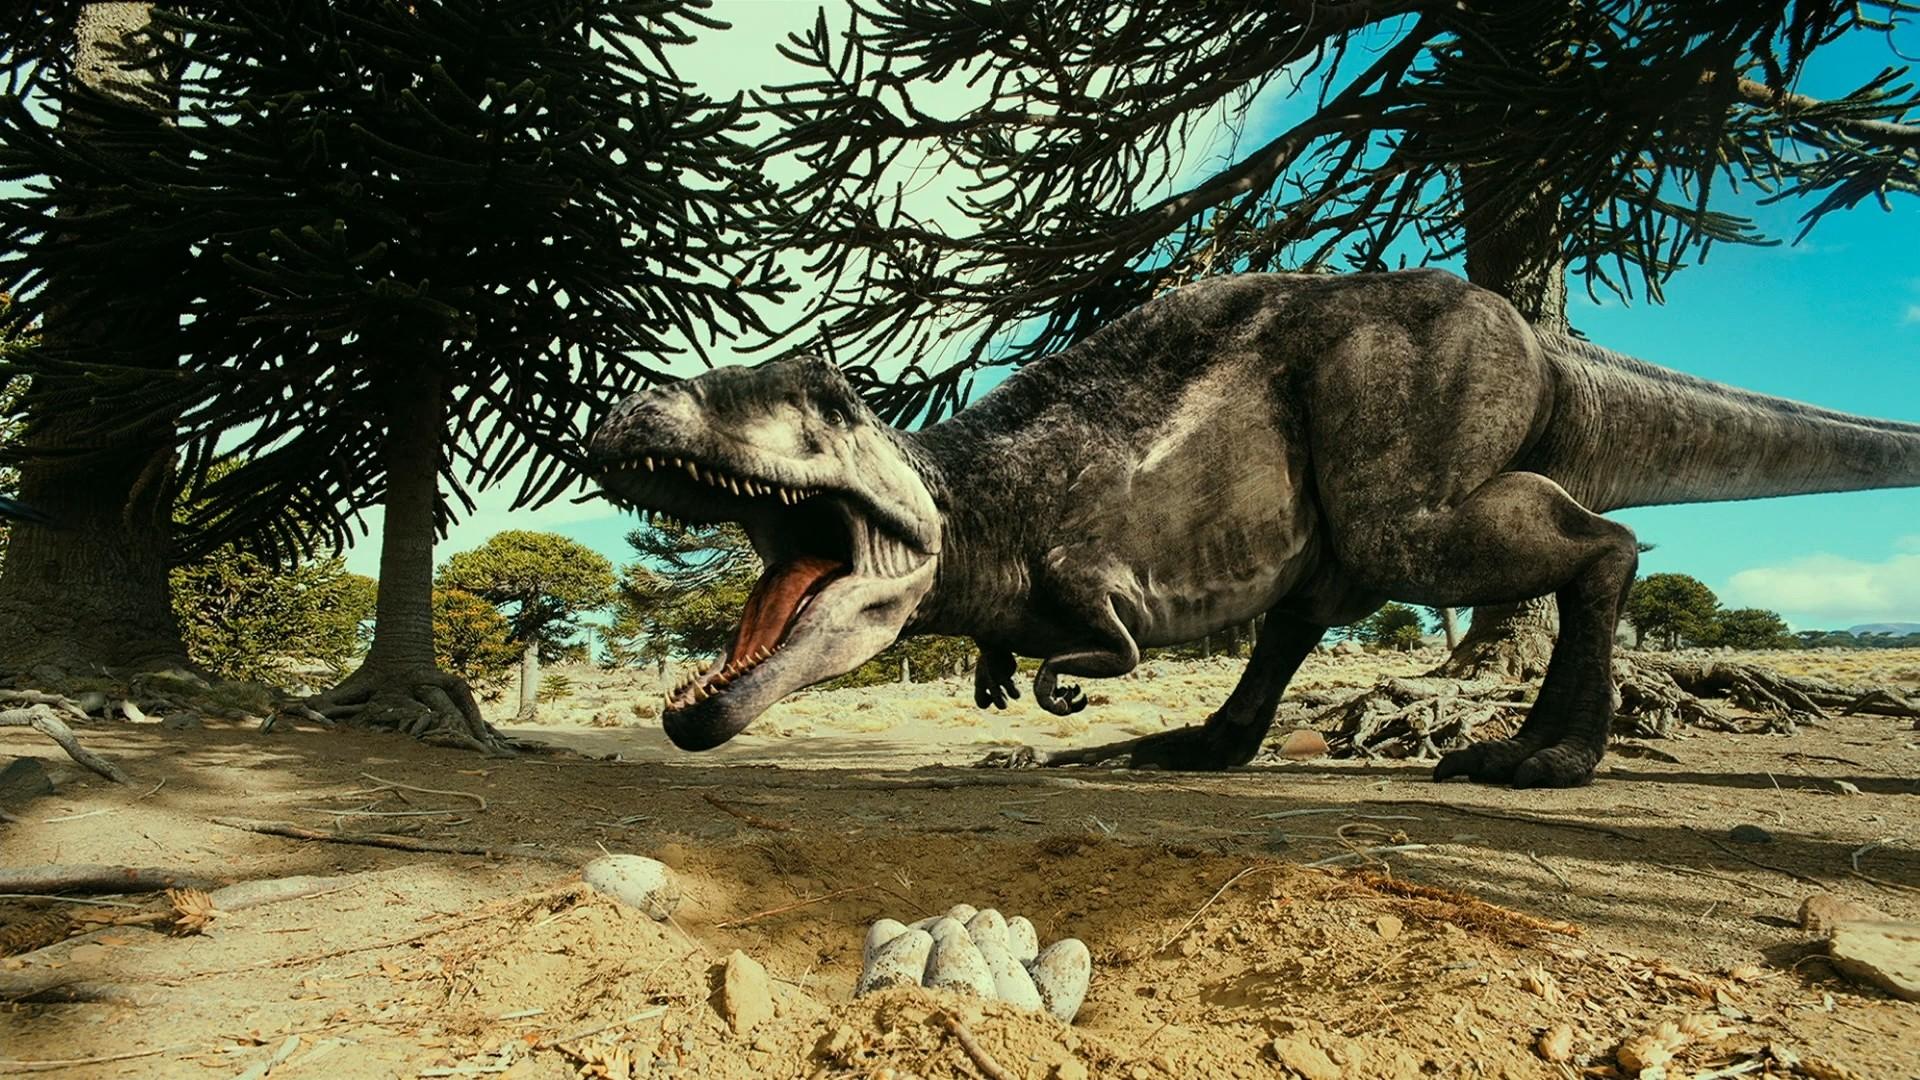 1920x1080, Free Dinosaur Wallpaper Hd Wallpapers Background - Giants Of Patagonia Dinosaurs - HD Wallpaper